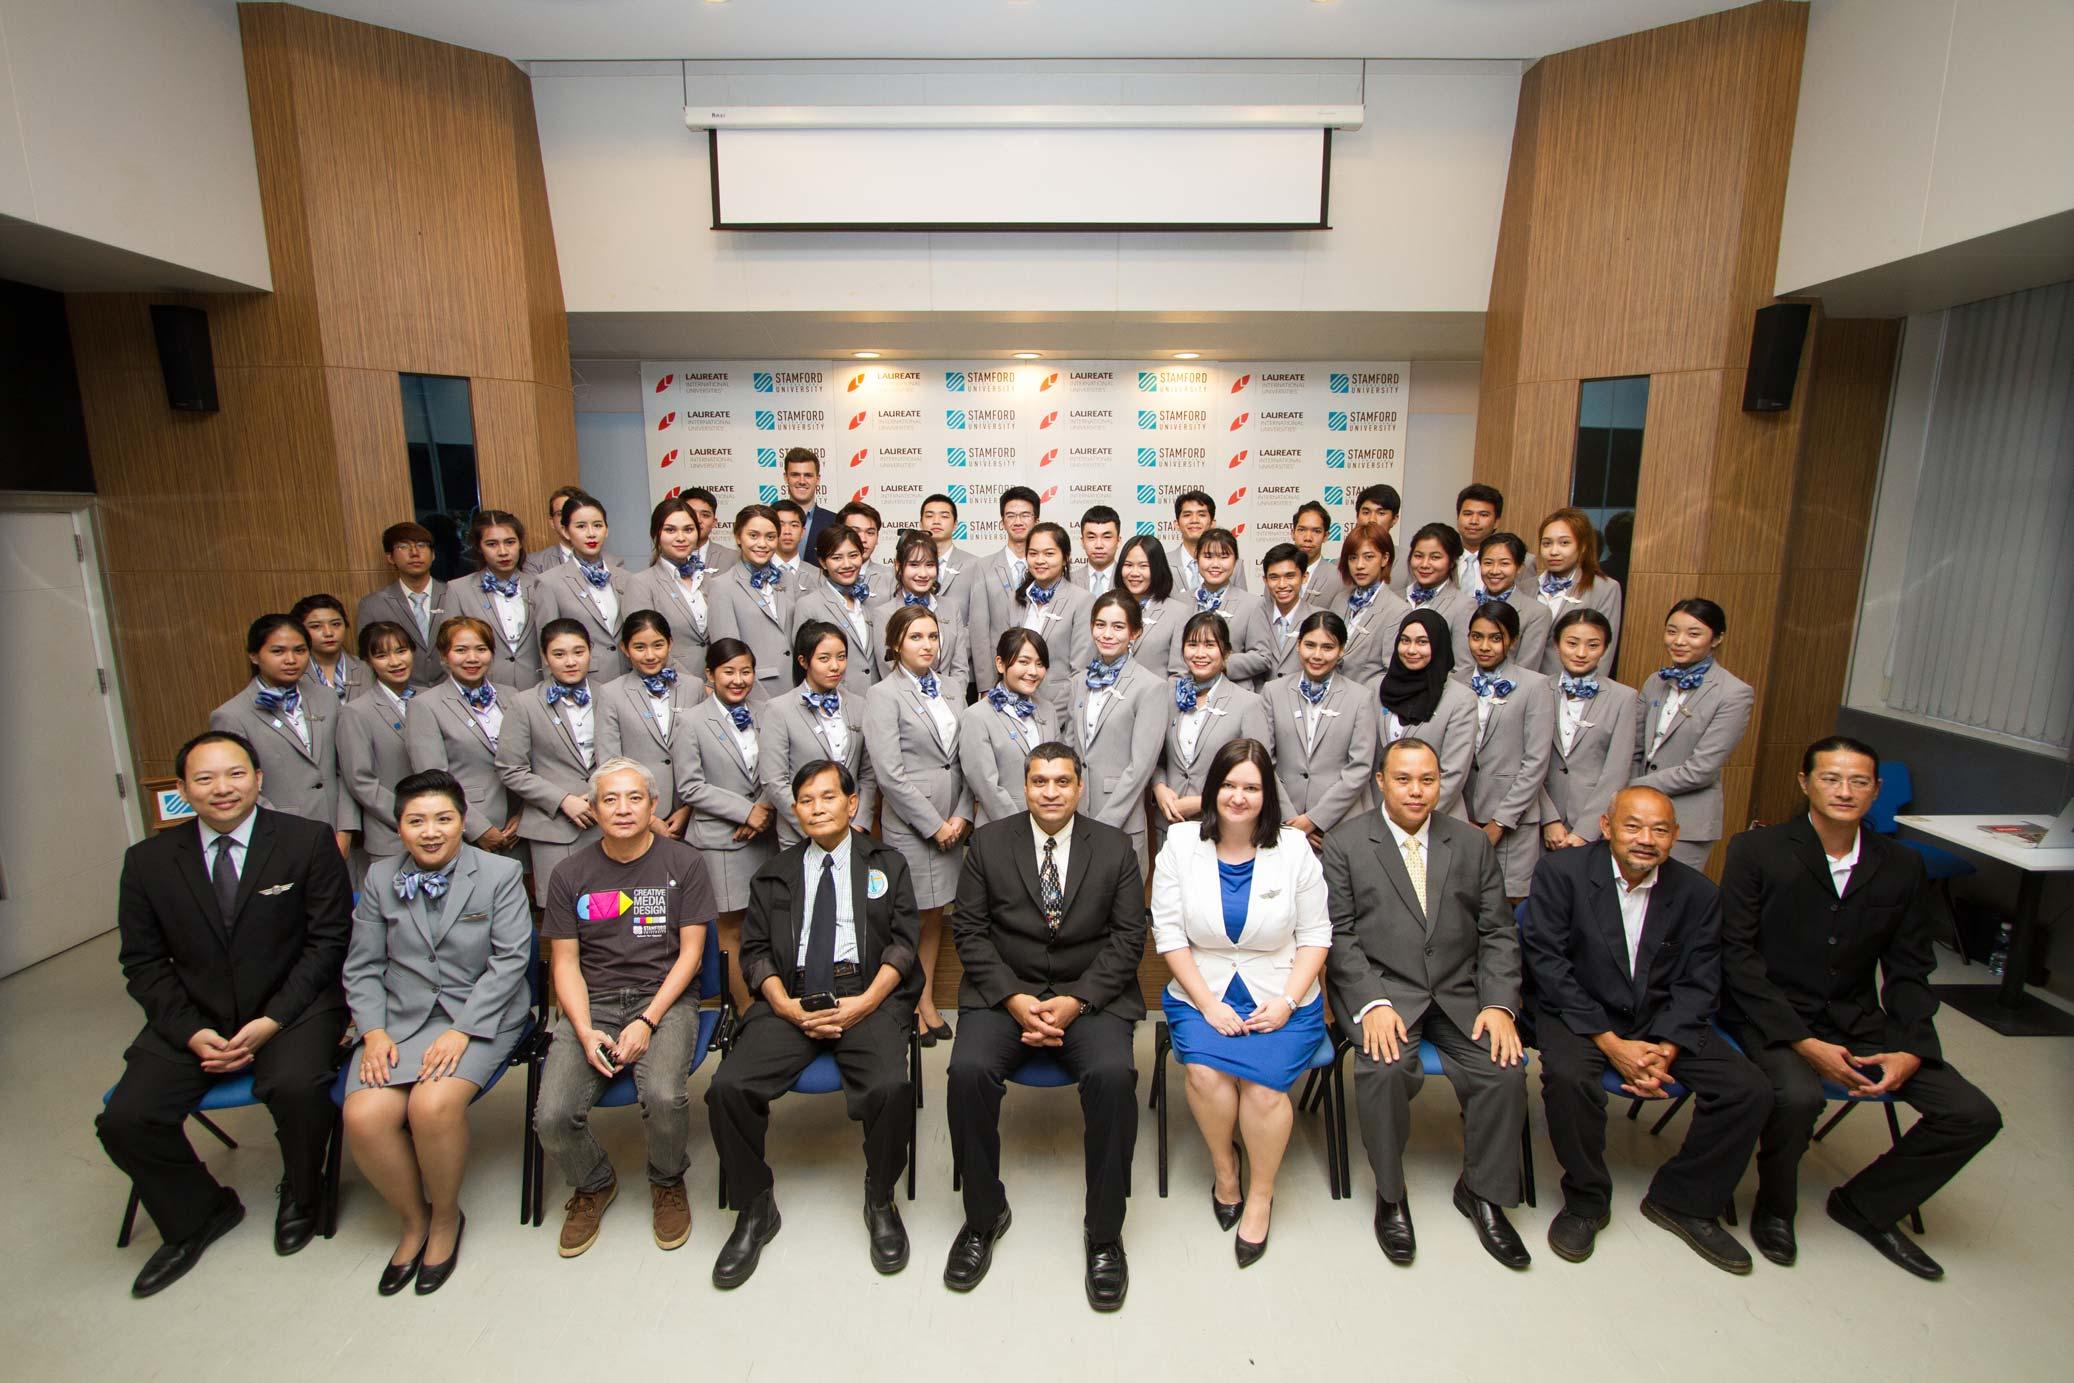 Kết quả hình ảnh cho Airlines Business Management Program stamford thailand